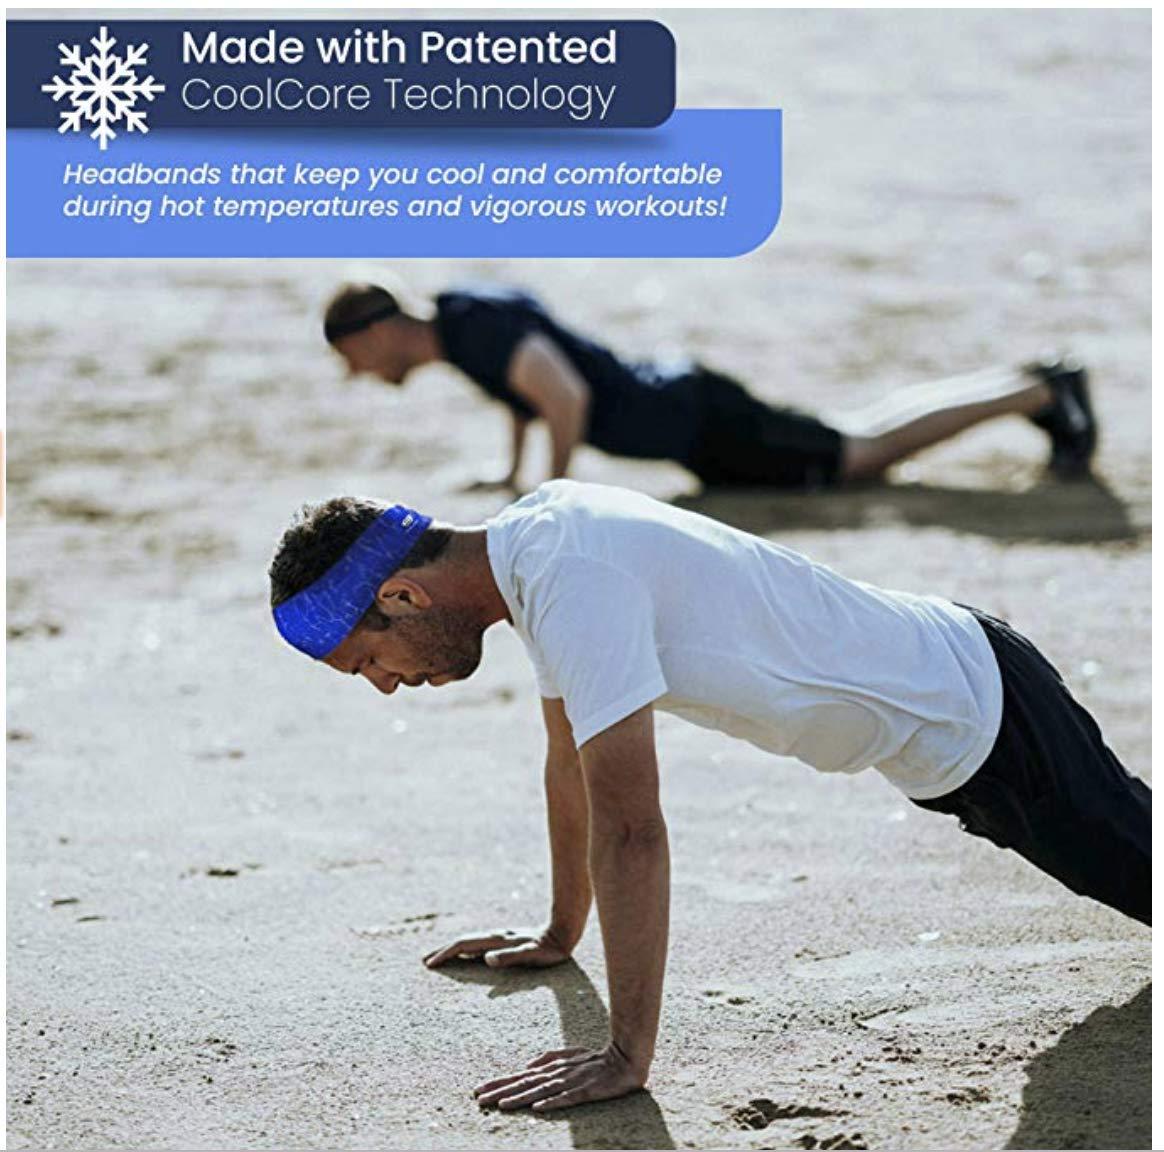 Cooling Headbands Moisture Wicking Womens Sweatband & Sports Headband | Workouts Cardio Running Yoga (Orange Camo) by Bani Bands (Image #3)